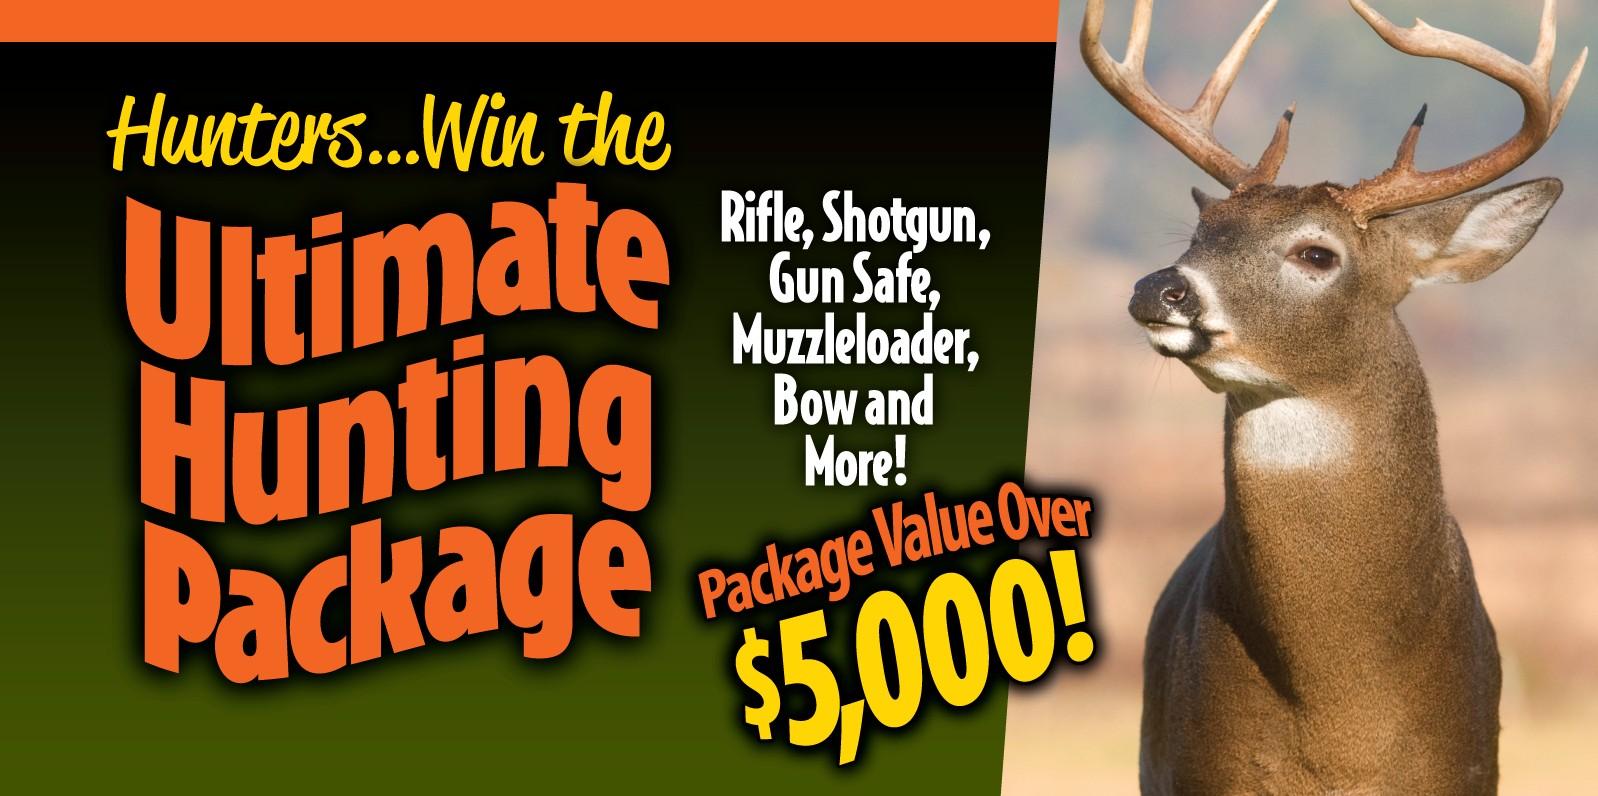 Ultimate Hunting Package '14